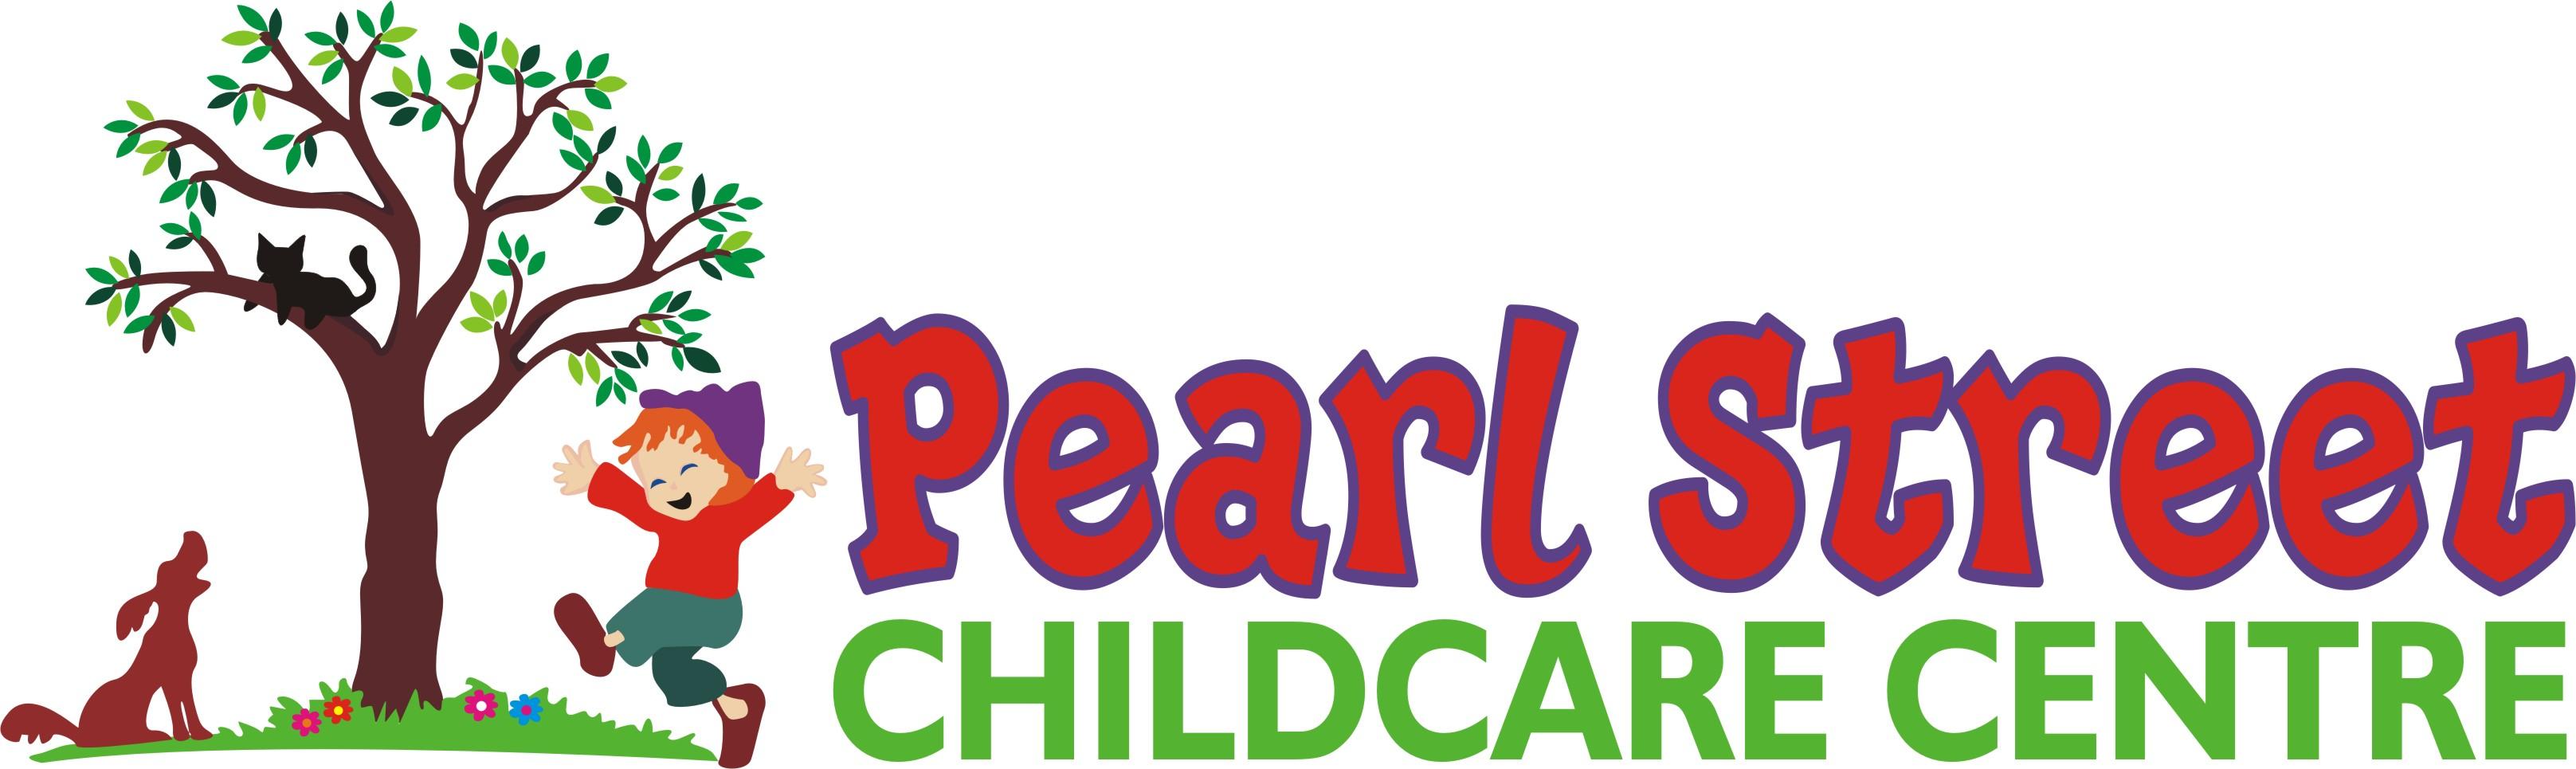 pearl-street-cc-logo